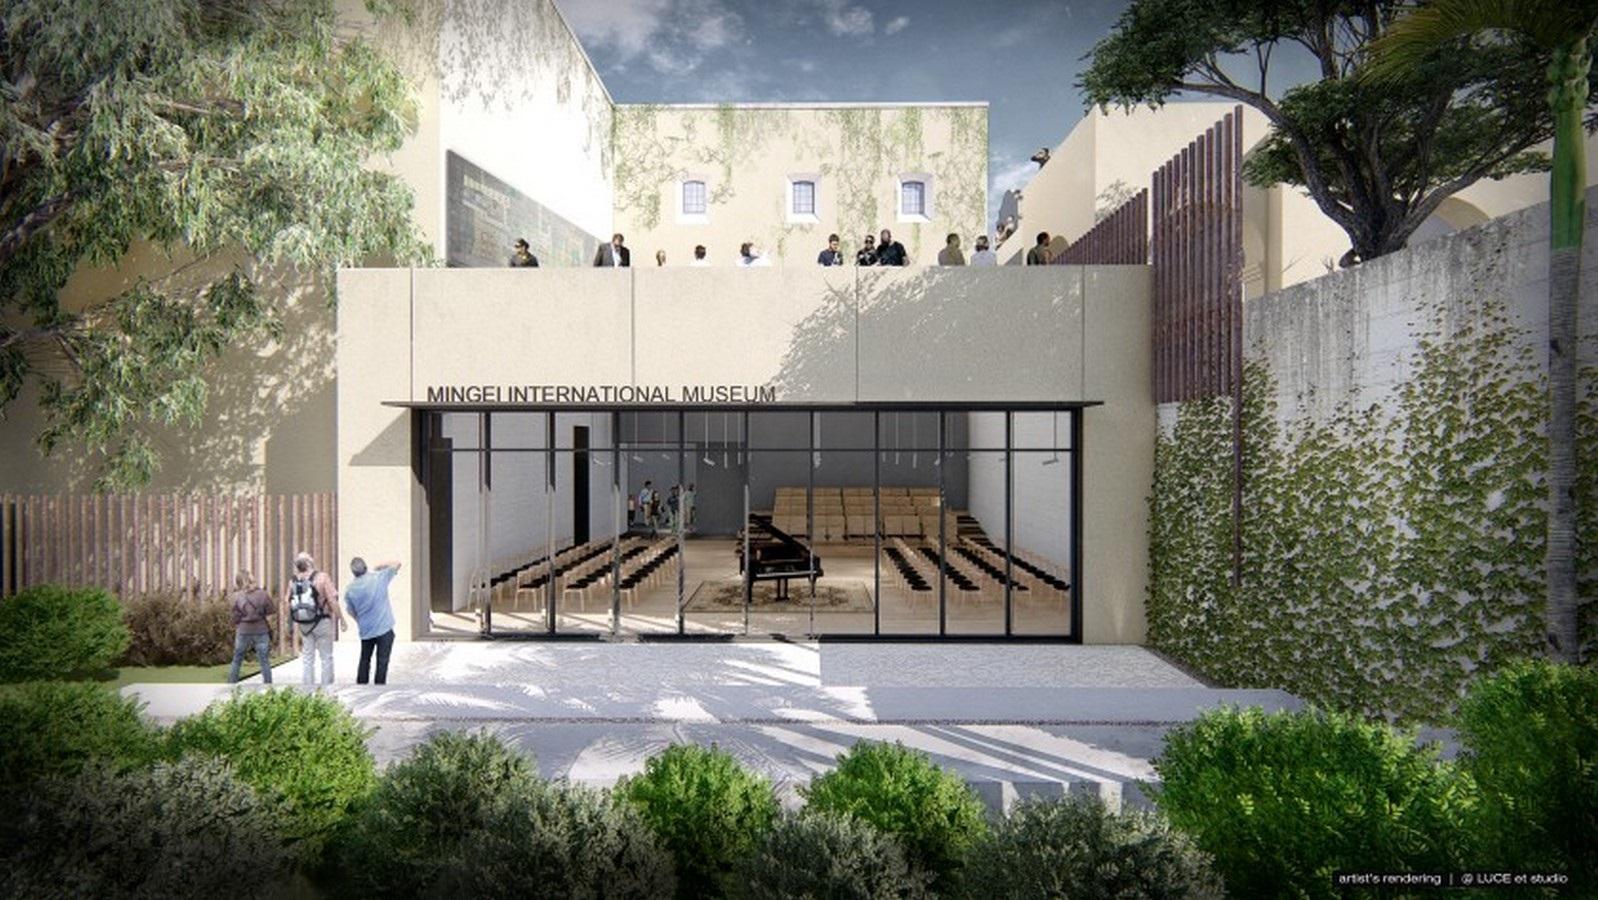 Mingei International Museum, San Diego reimagined by LUCE et Studio - Sheet4